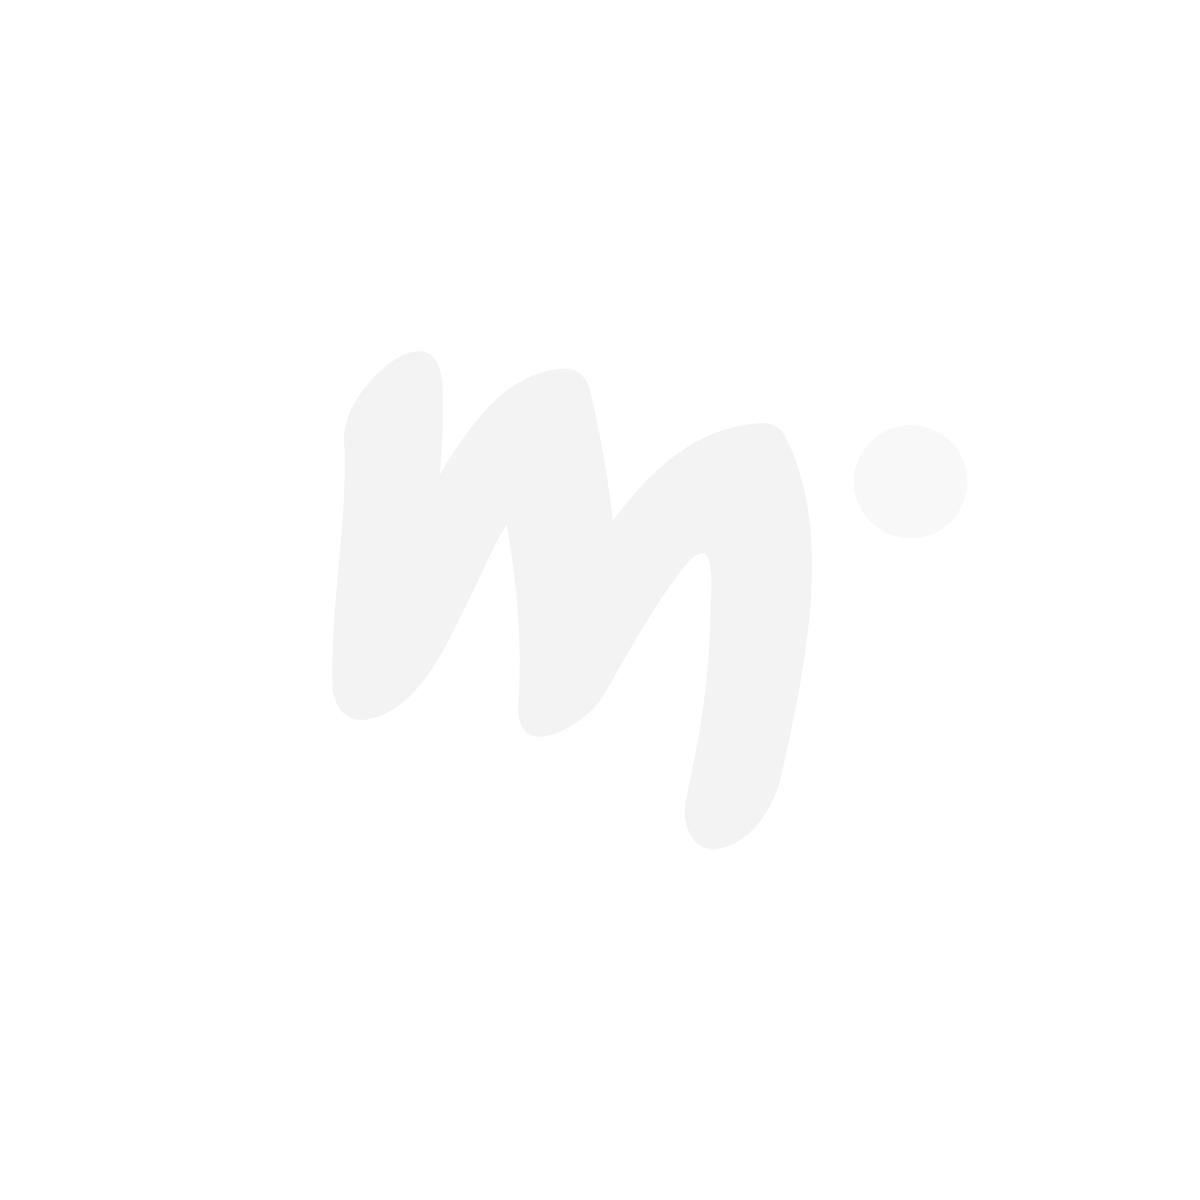 Muumi Syyshetki-tunika harmaa